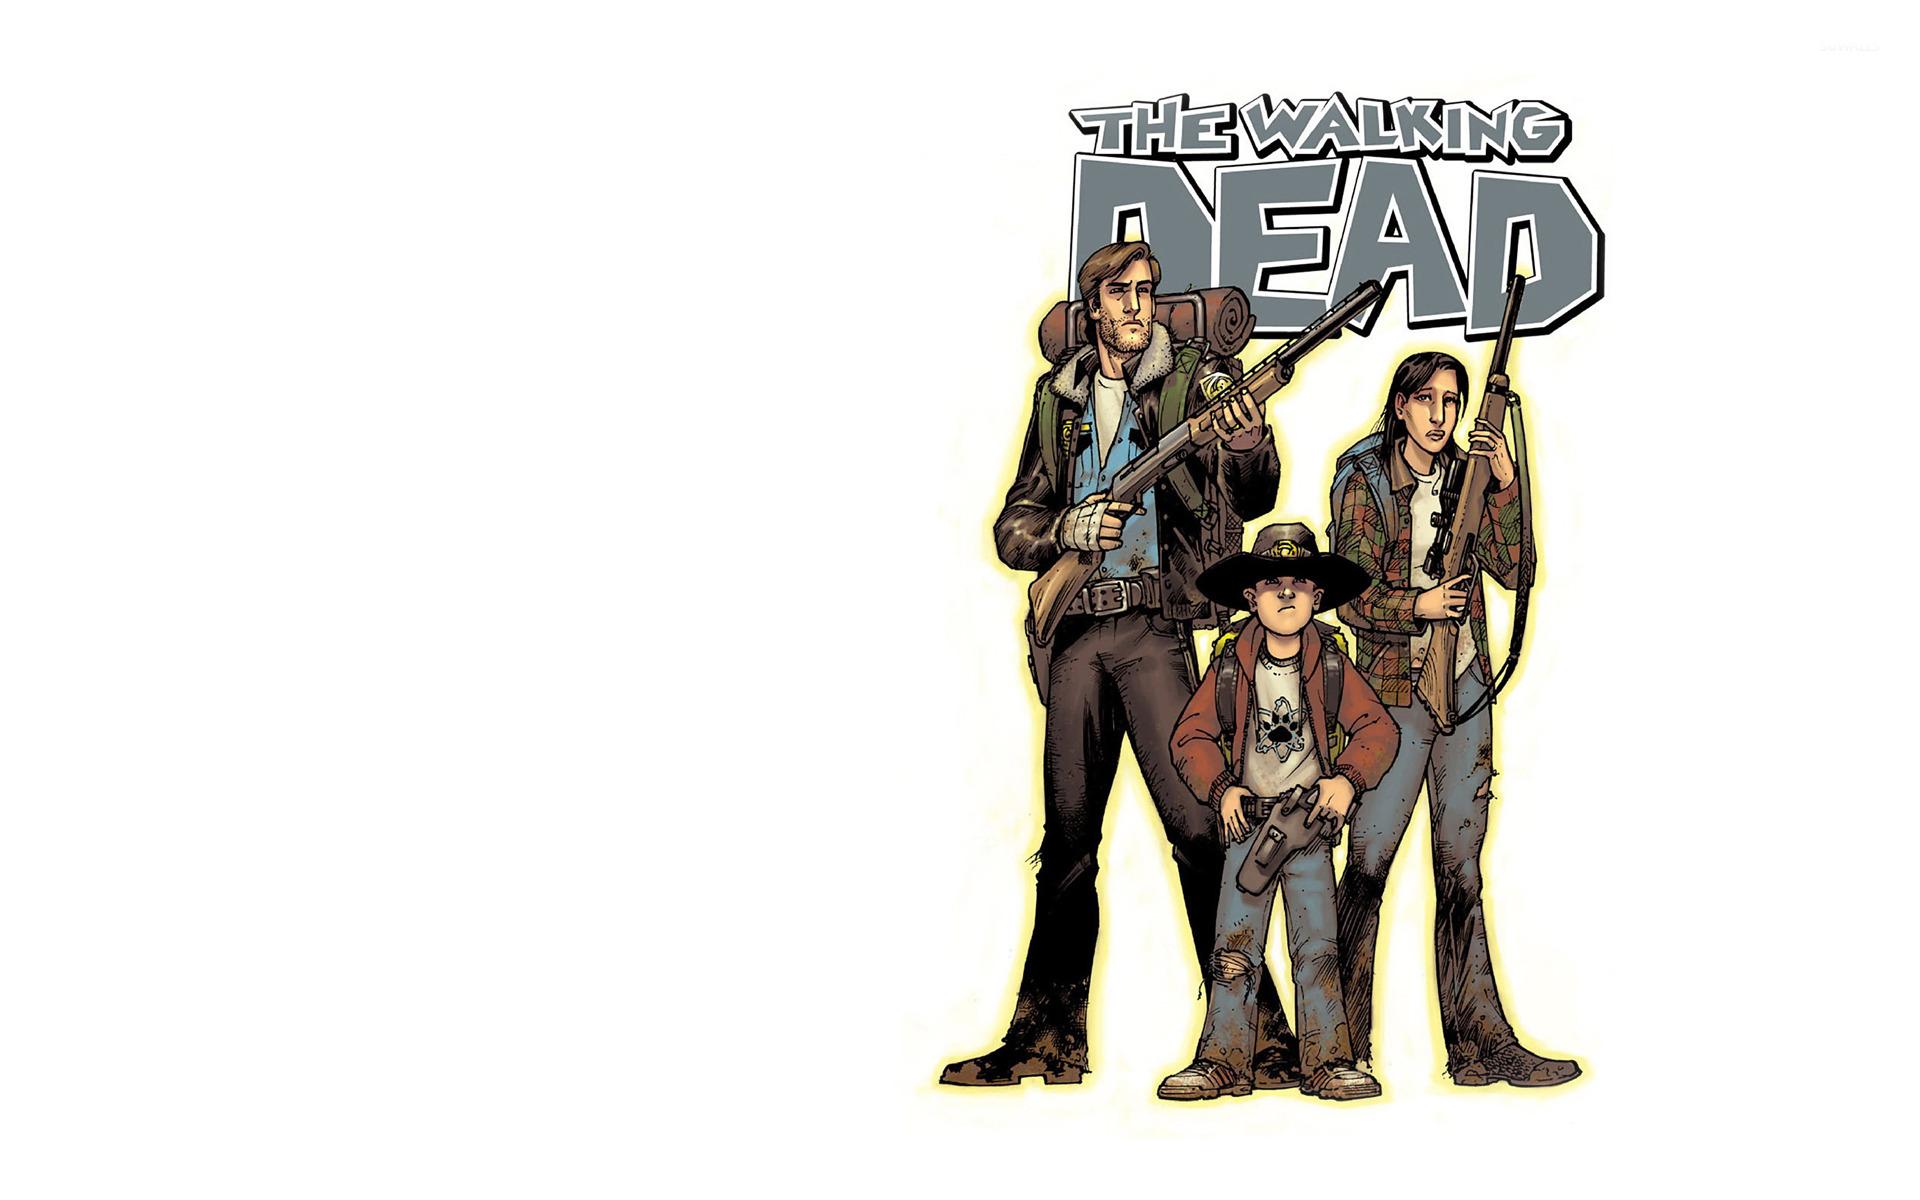 The Walking Dead 9 Wallpaper Comic Wallpapers 15133